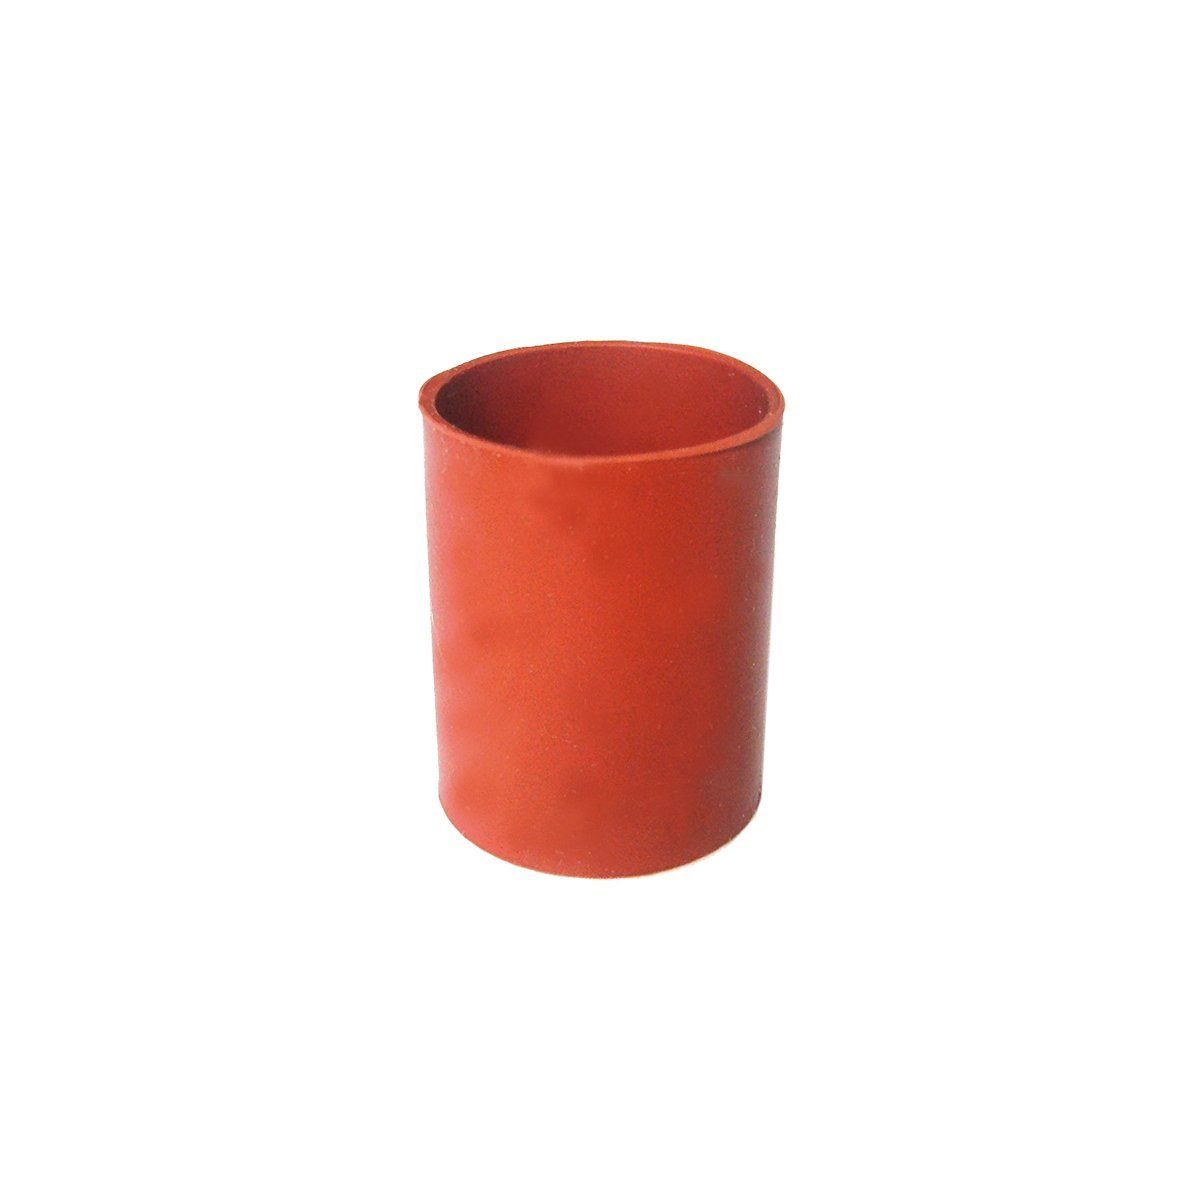 Aluminium Pressurised Portafilter in Black Including 2 Cup Filter Basket for Gaggia Carezza Deluxe models Gaggia//Saeco Original Part 996530073115